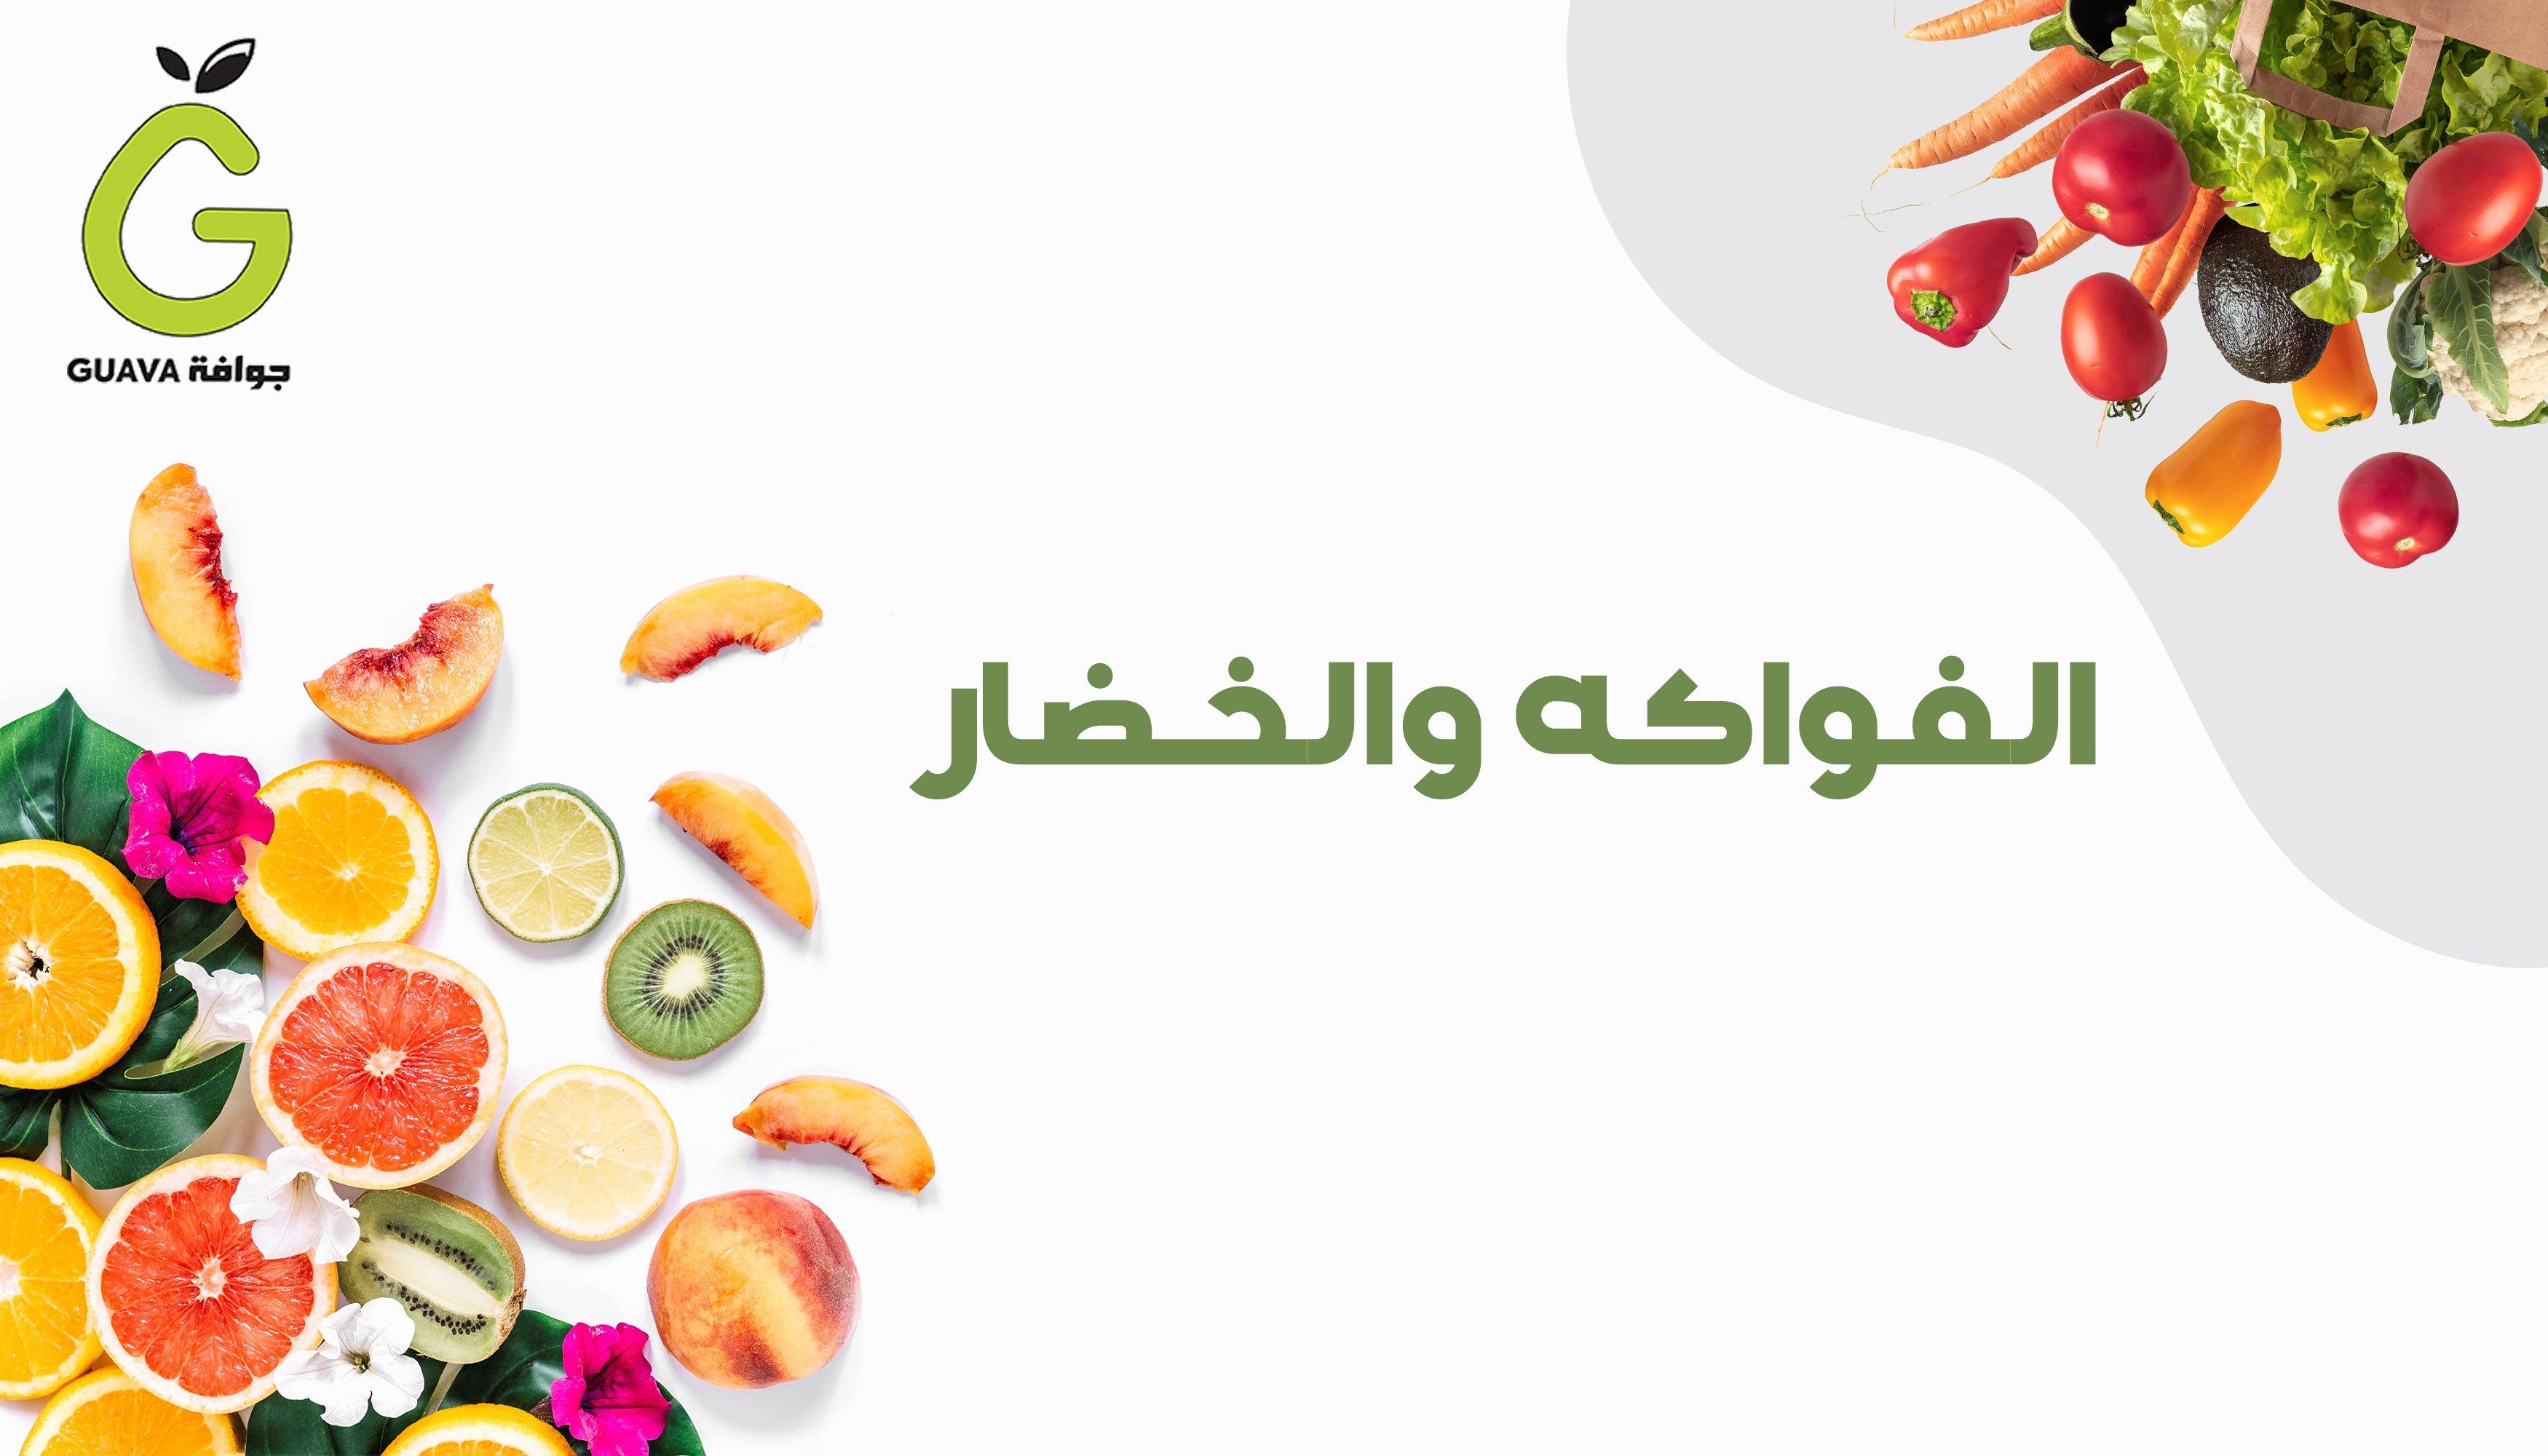 الفواكه والخضار vegetables and fruits